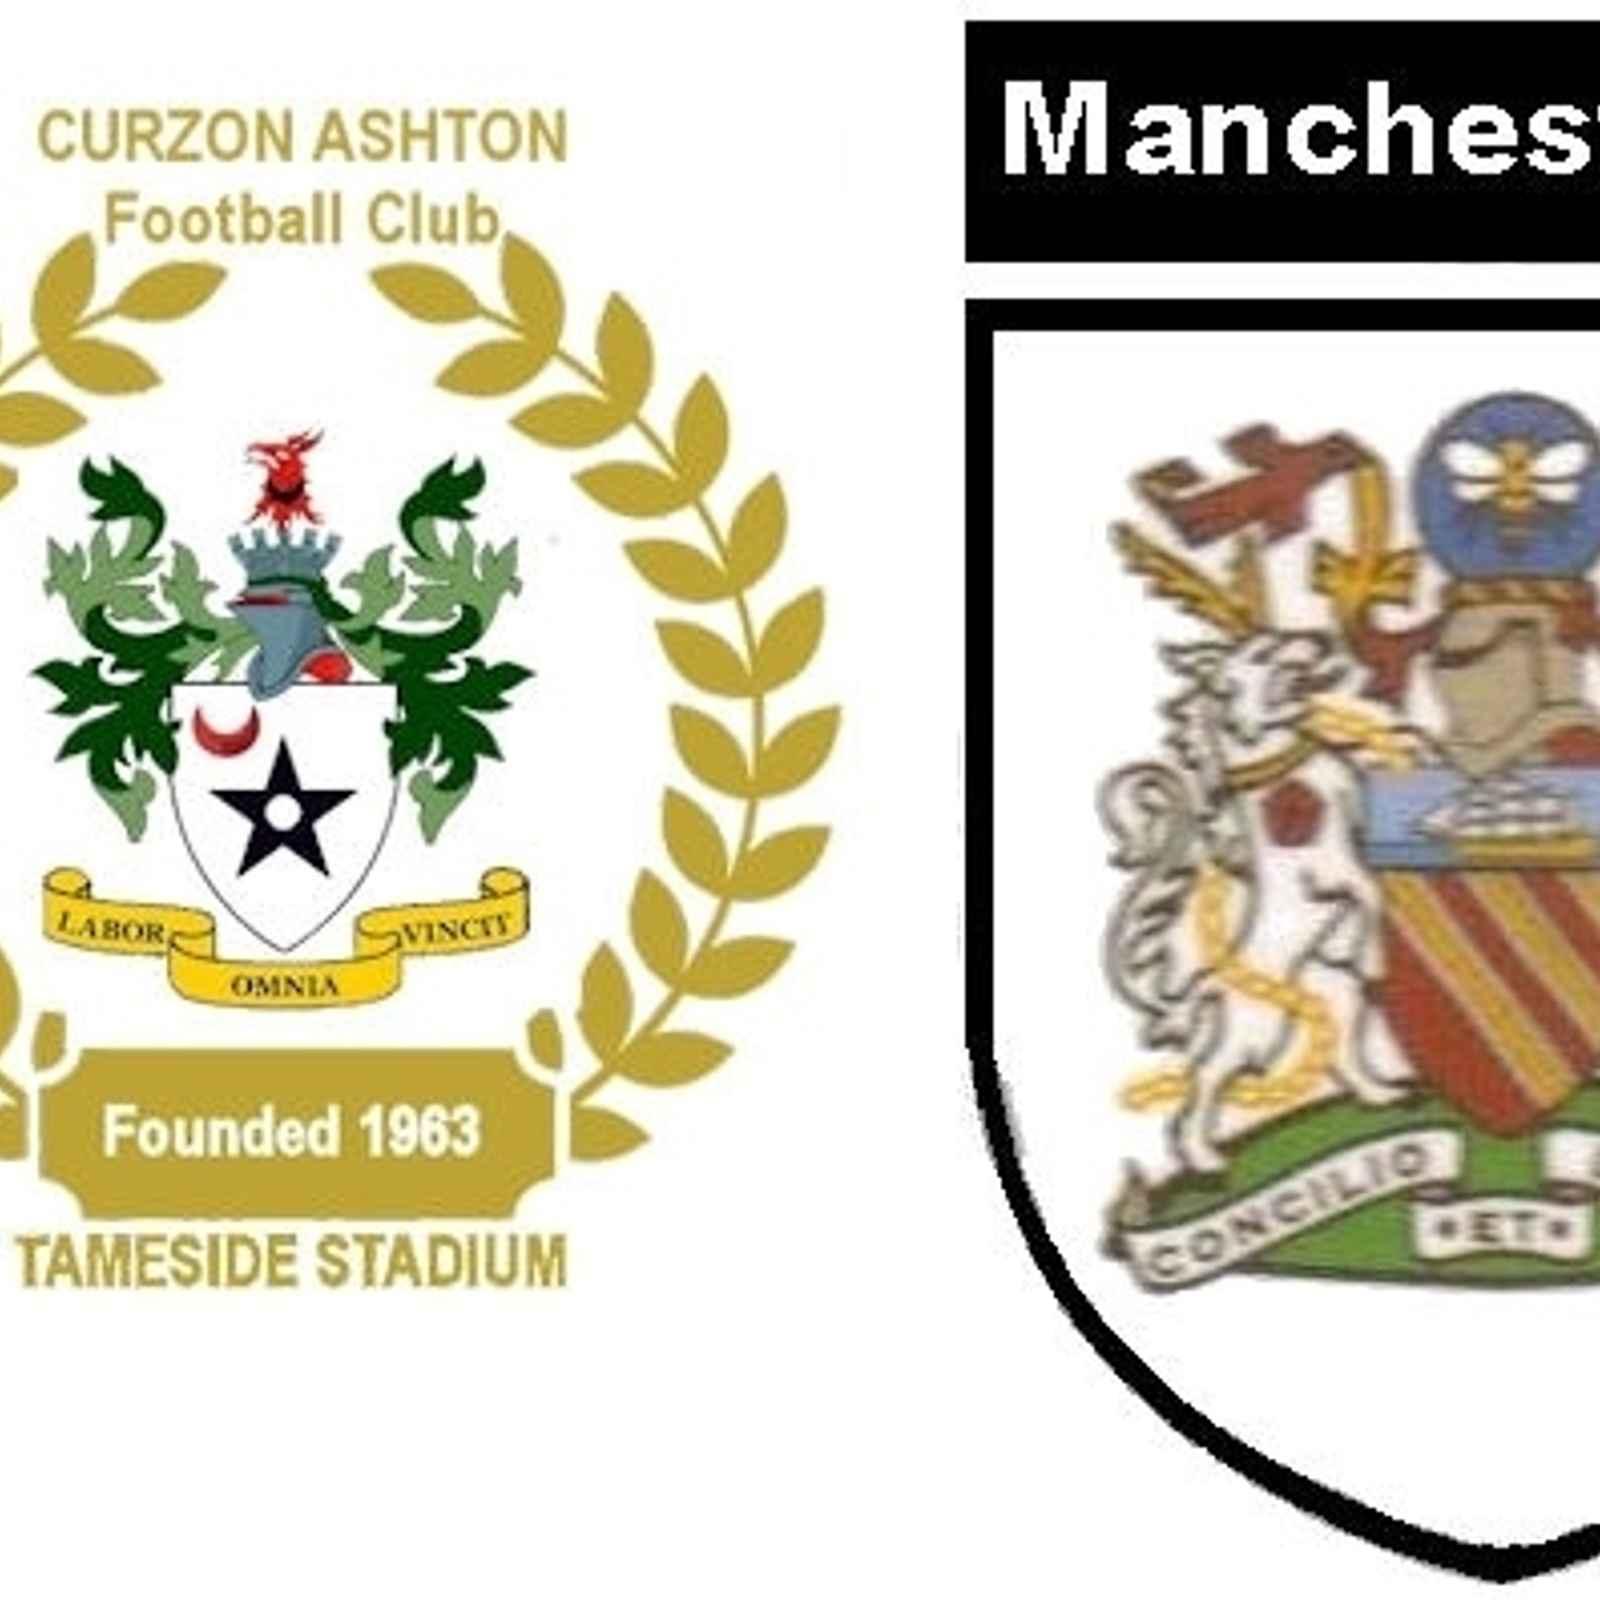 Celebrate Community Football Day with MCFA & Curzon Ashton FC